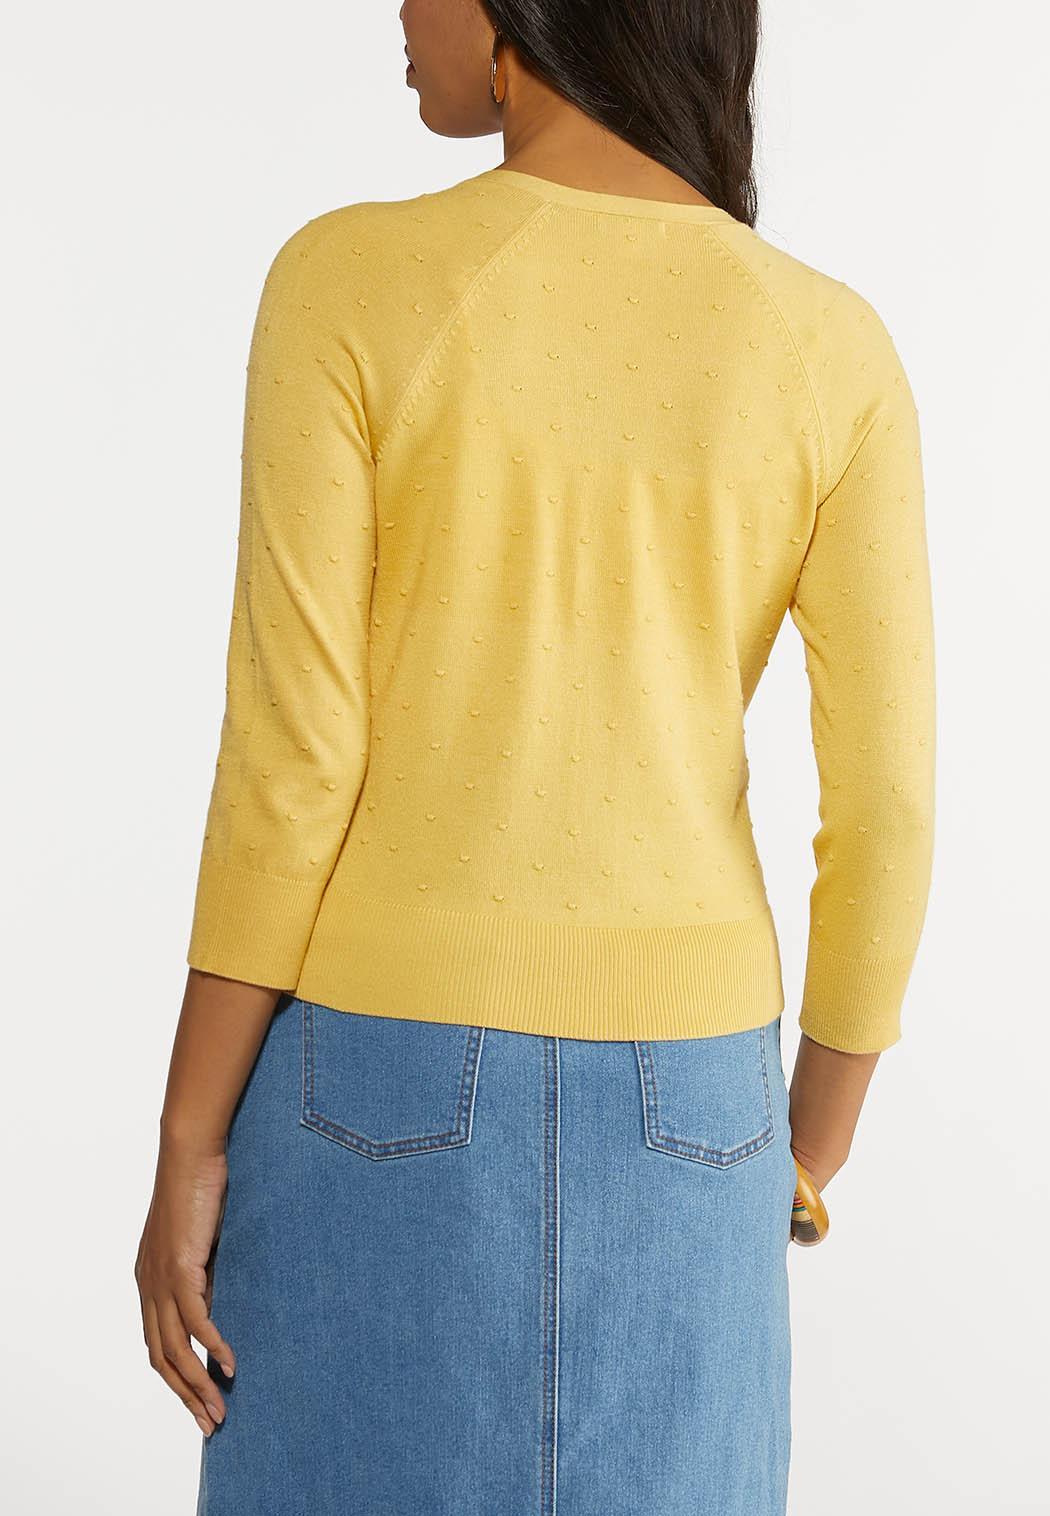 Plus Size Cropped Cardigan Sweater (Item #44269691)